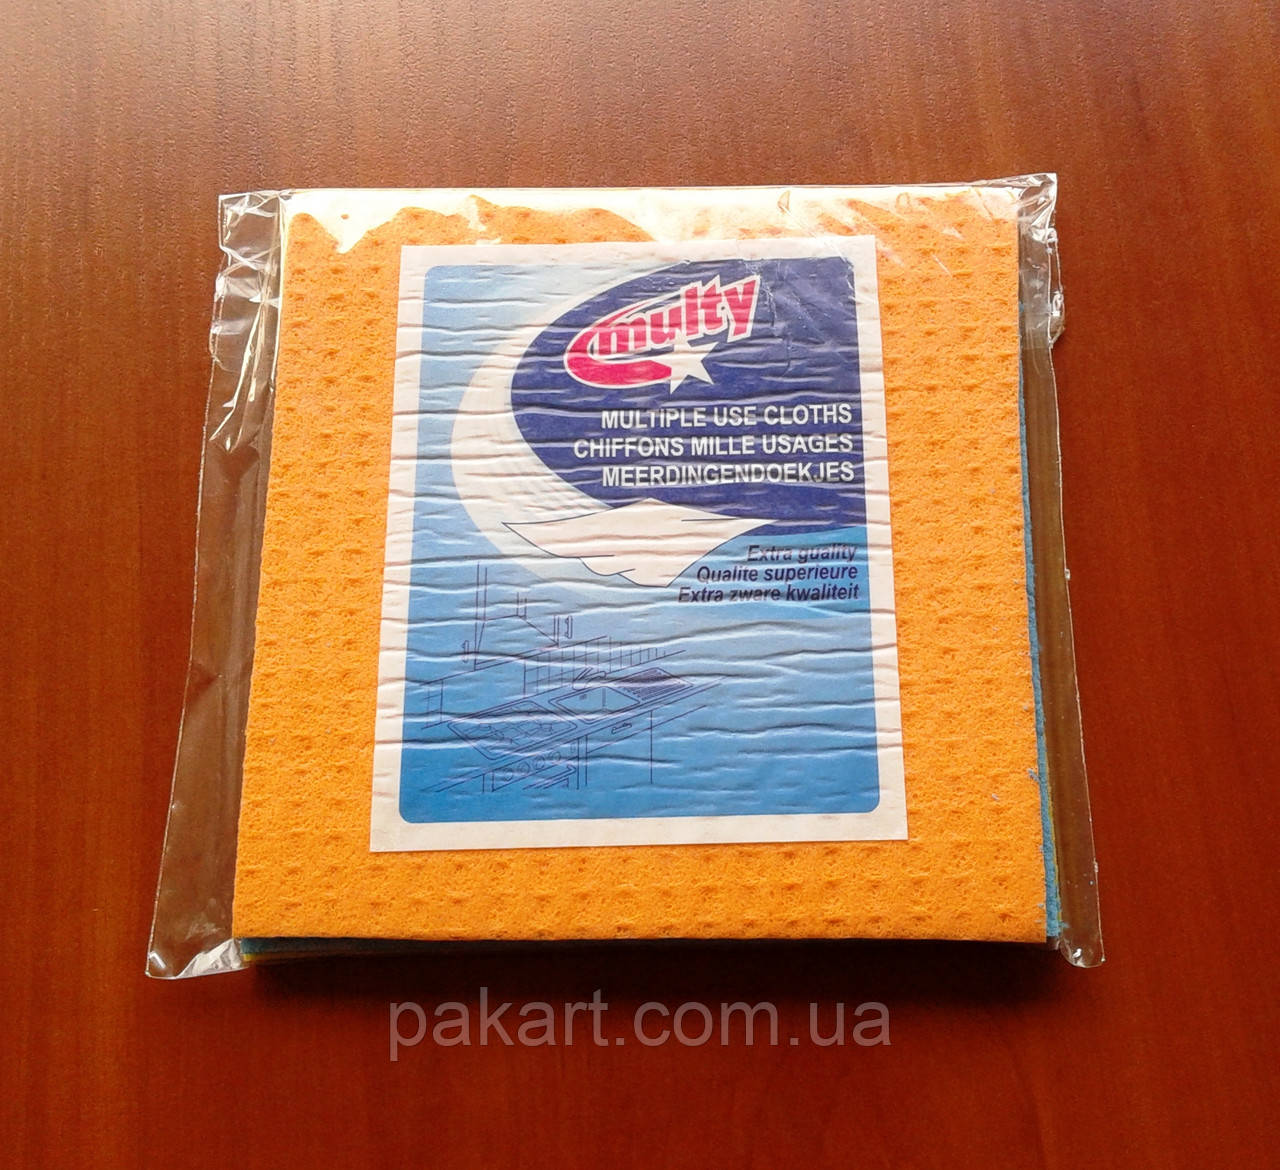 Упаковка вологопоглинаючих серветок. Упаковка влаговпитывающих салфеток